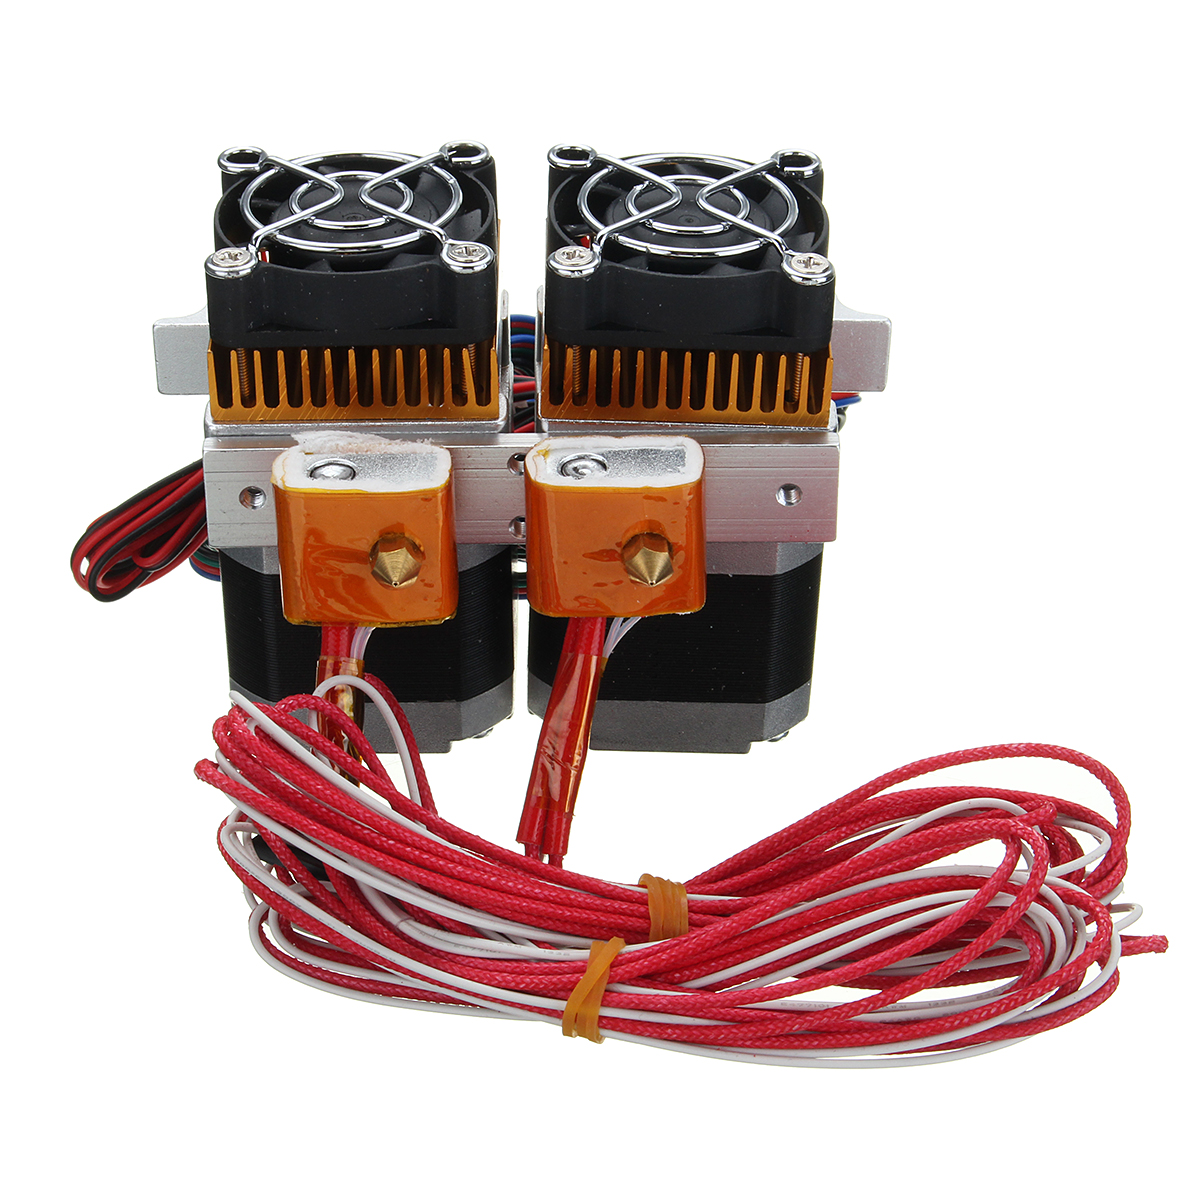 24V MK8 Upgrade 3D Print Head Kit 1.75mm Filament Extra Nozzle 0.4MM Feed Inlet Diameter 3D Printer Nozzle Extruder For Prusa i3 3D Printer